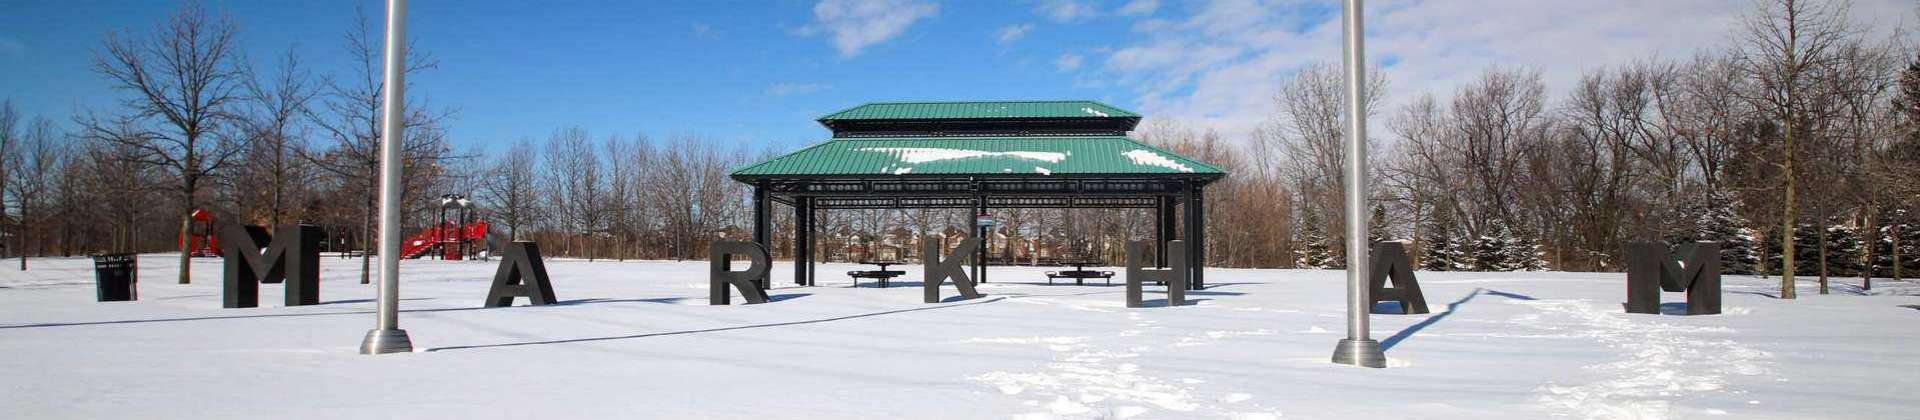 markham ontario winter park